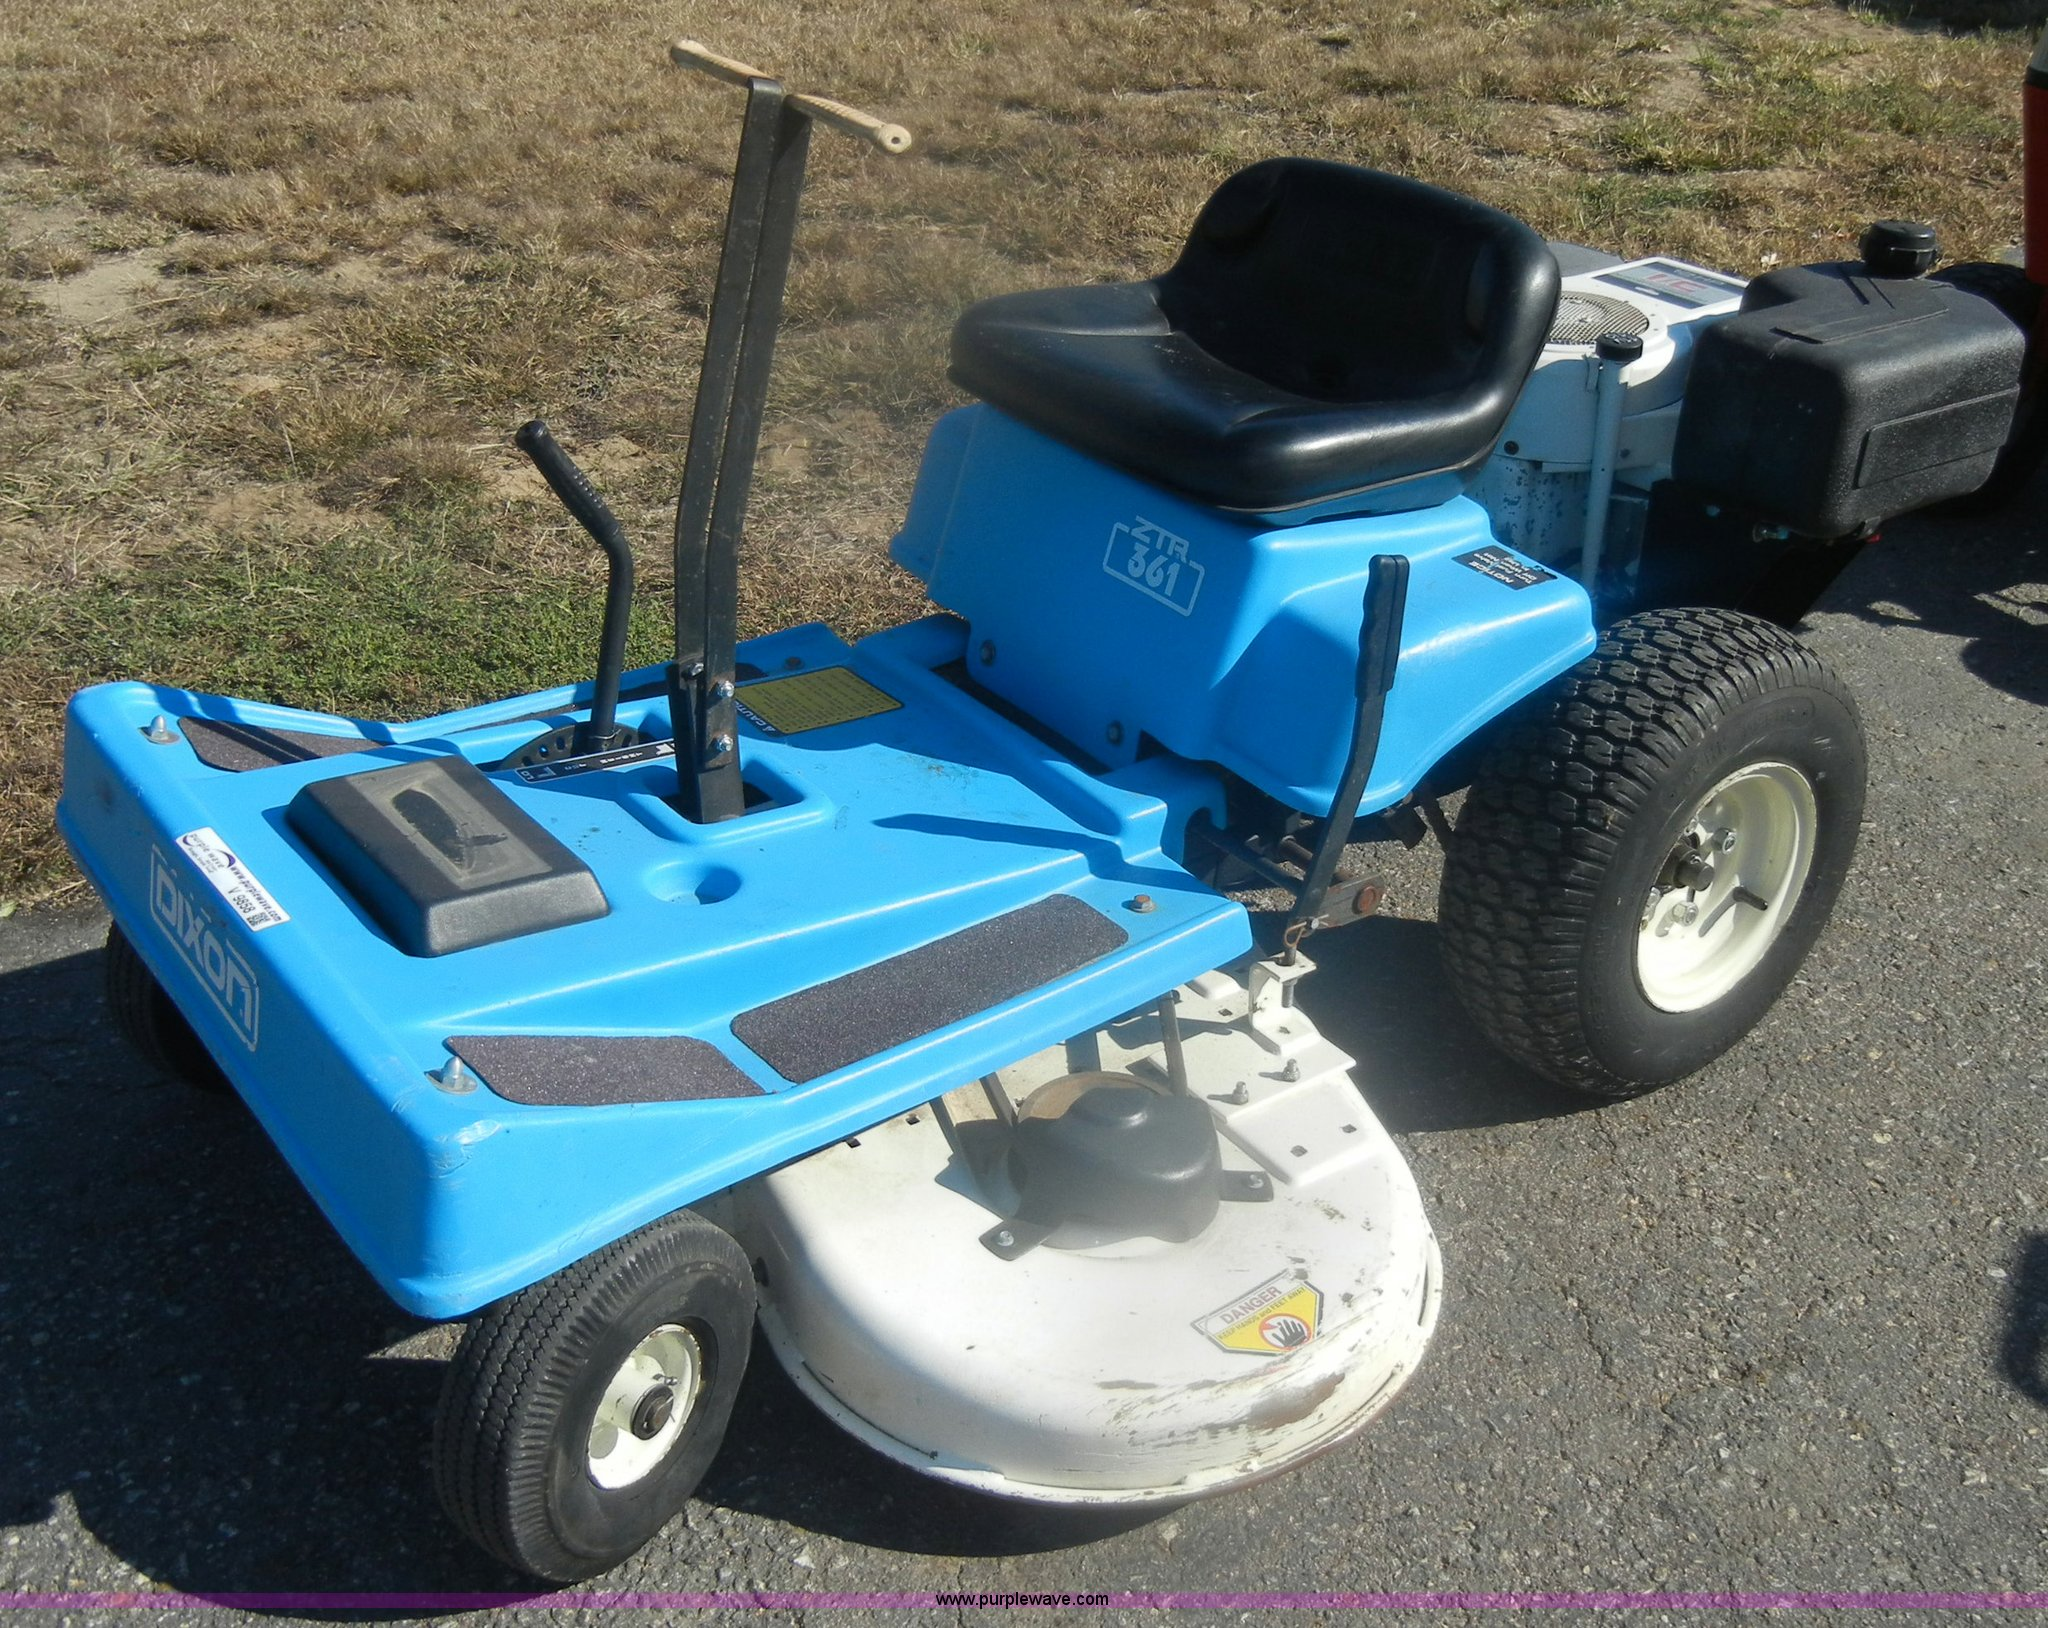 ... Dixon 361 ZTR lawn mower Full size in new window ...